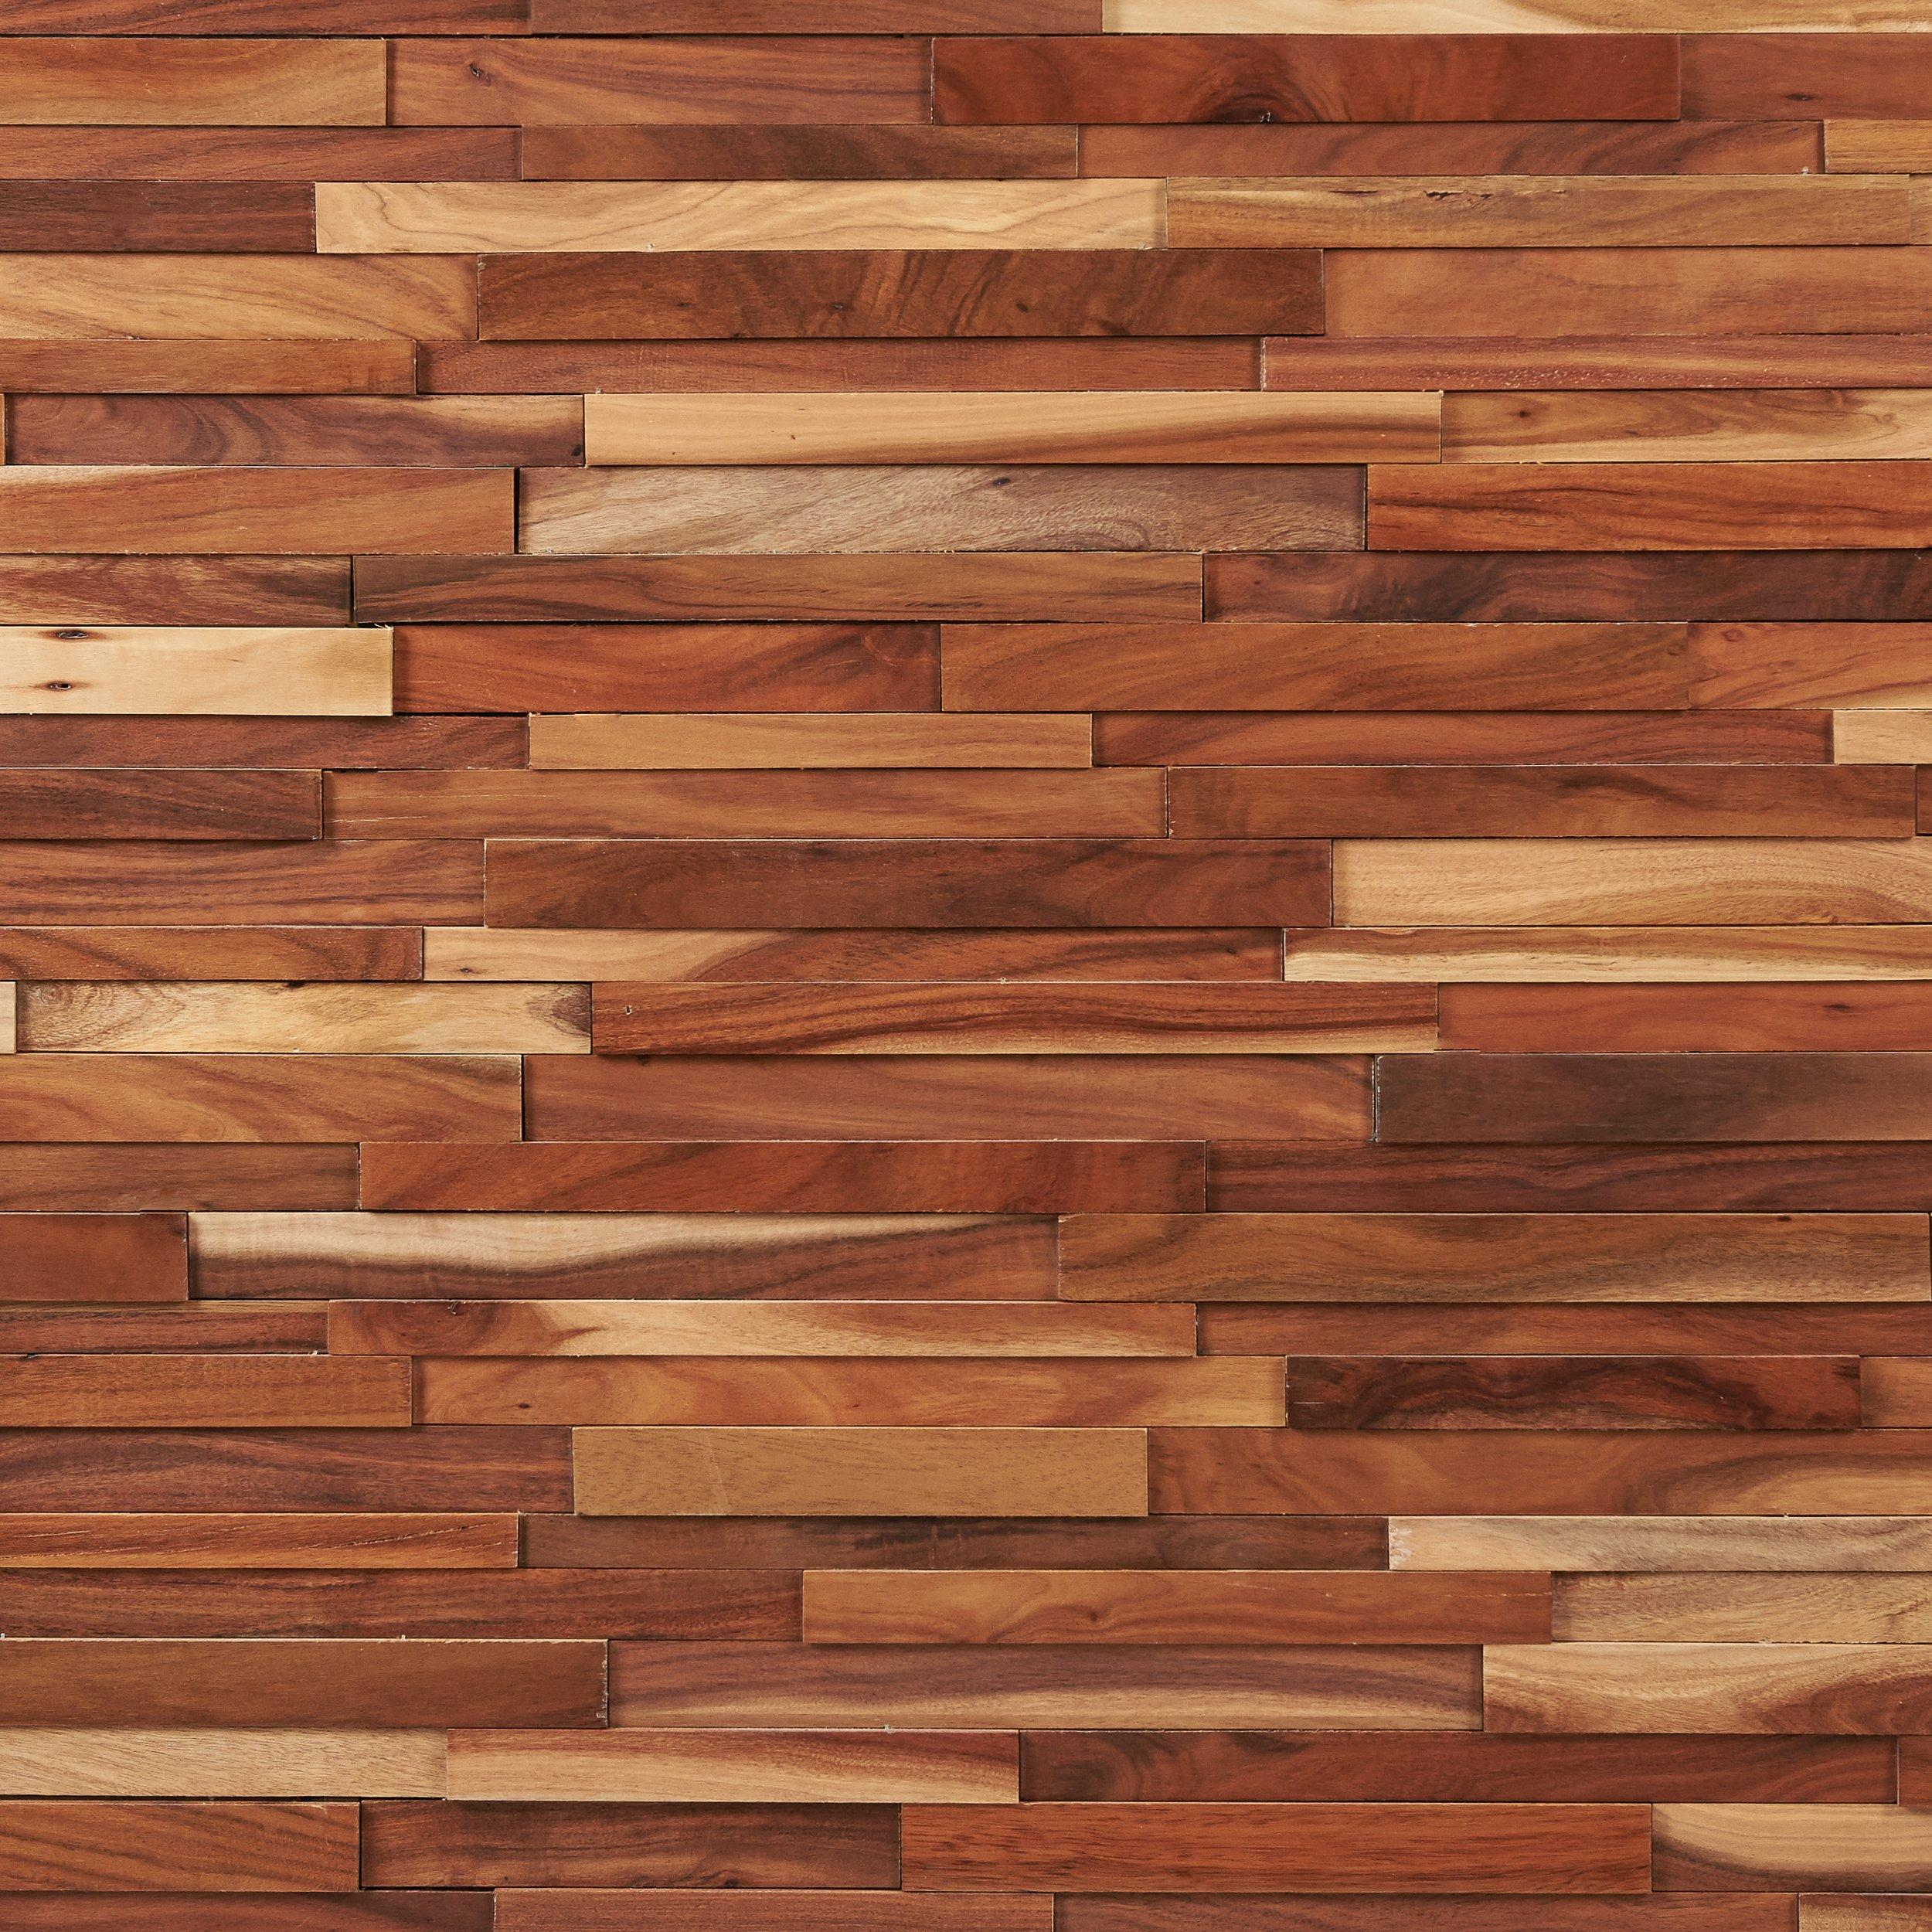 Small Leaf Acacia Hardwood Wall Plank Panel In 2020 Wall Planks Wood Mosaic Natural Flooring